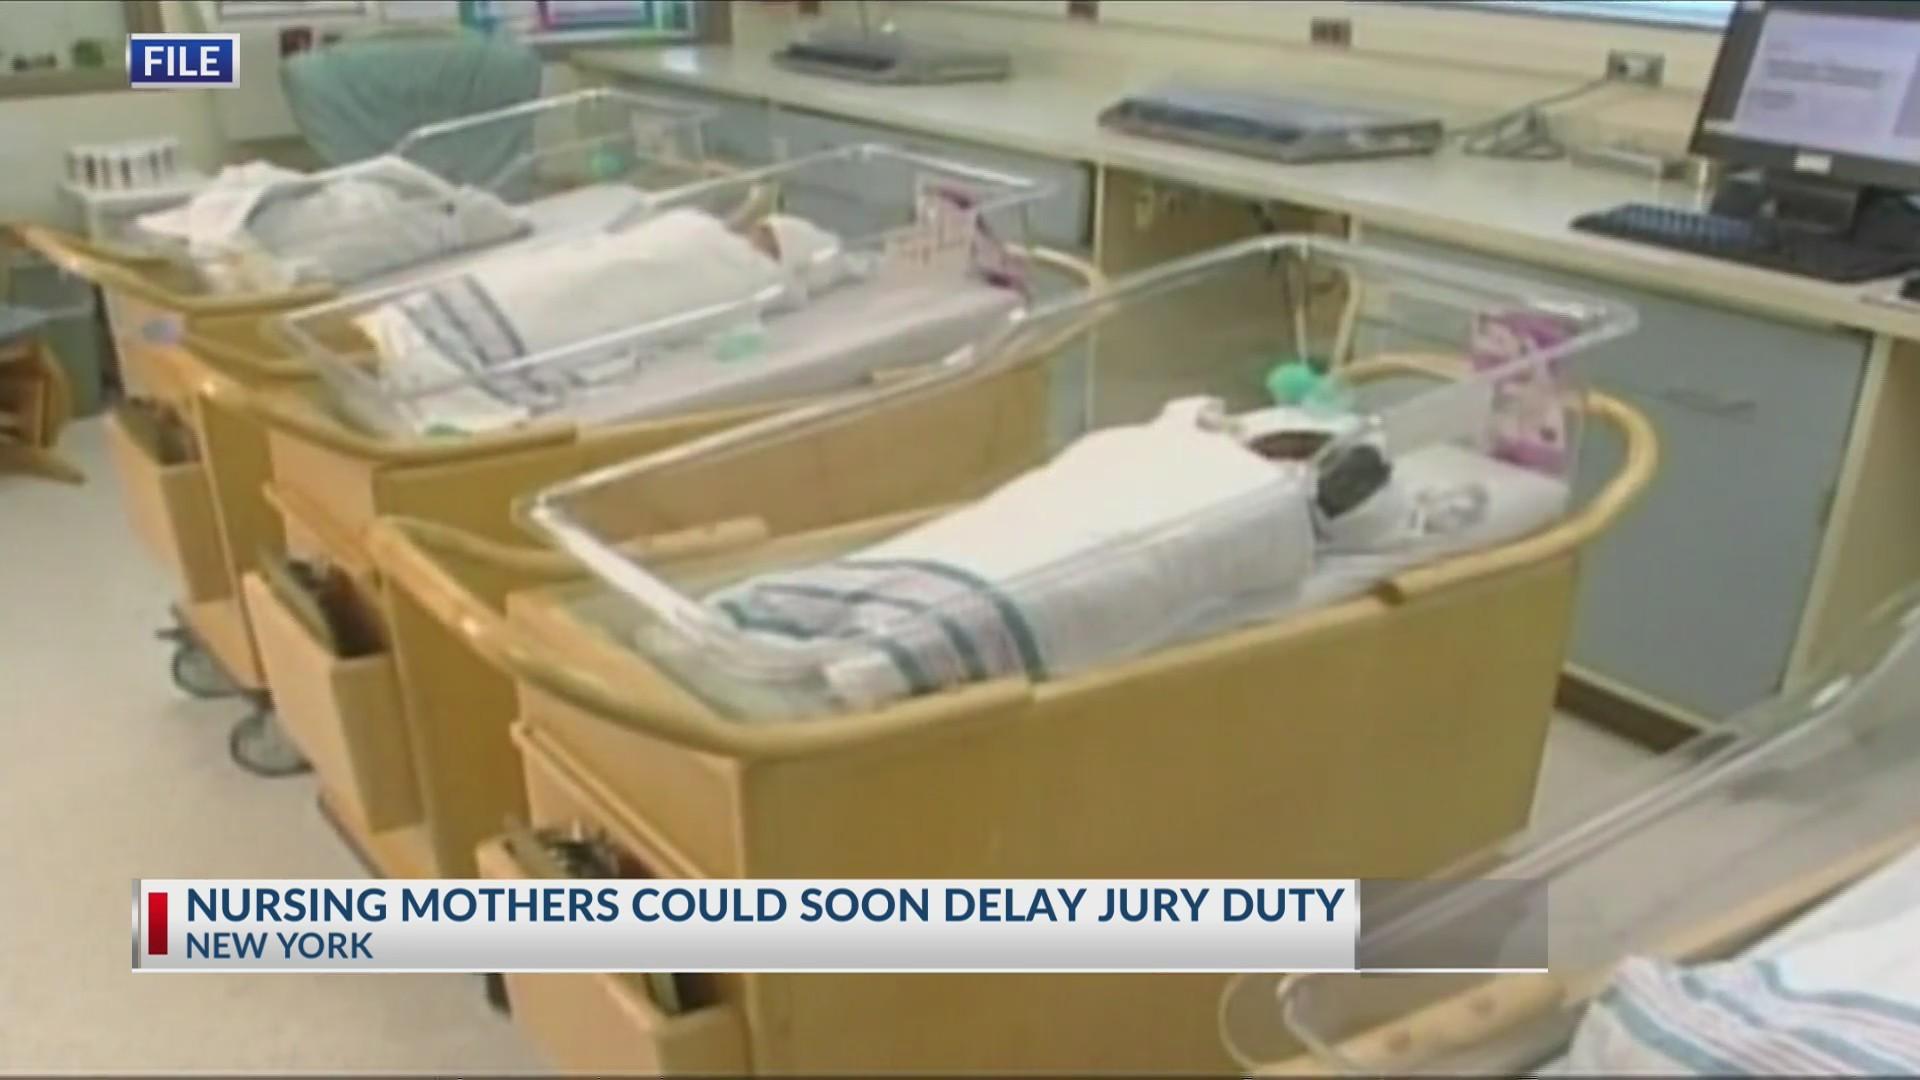 nursing_mothers_can_soon_delay_jury_duty_0_20190609031903